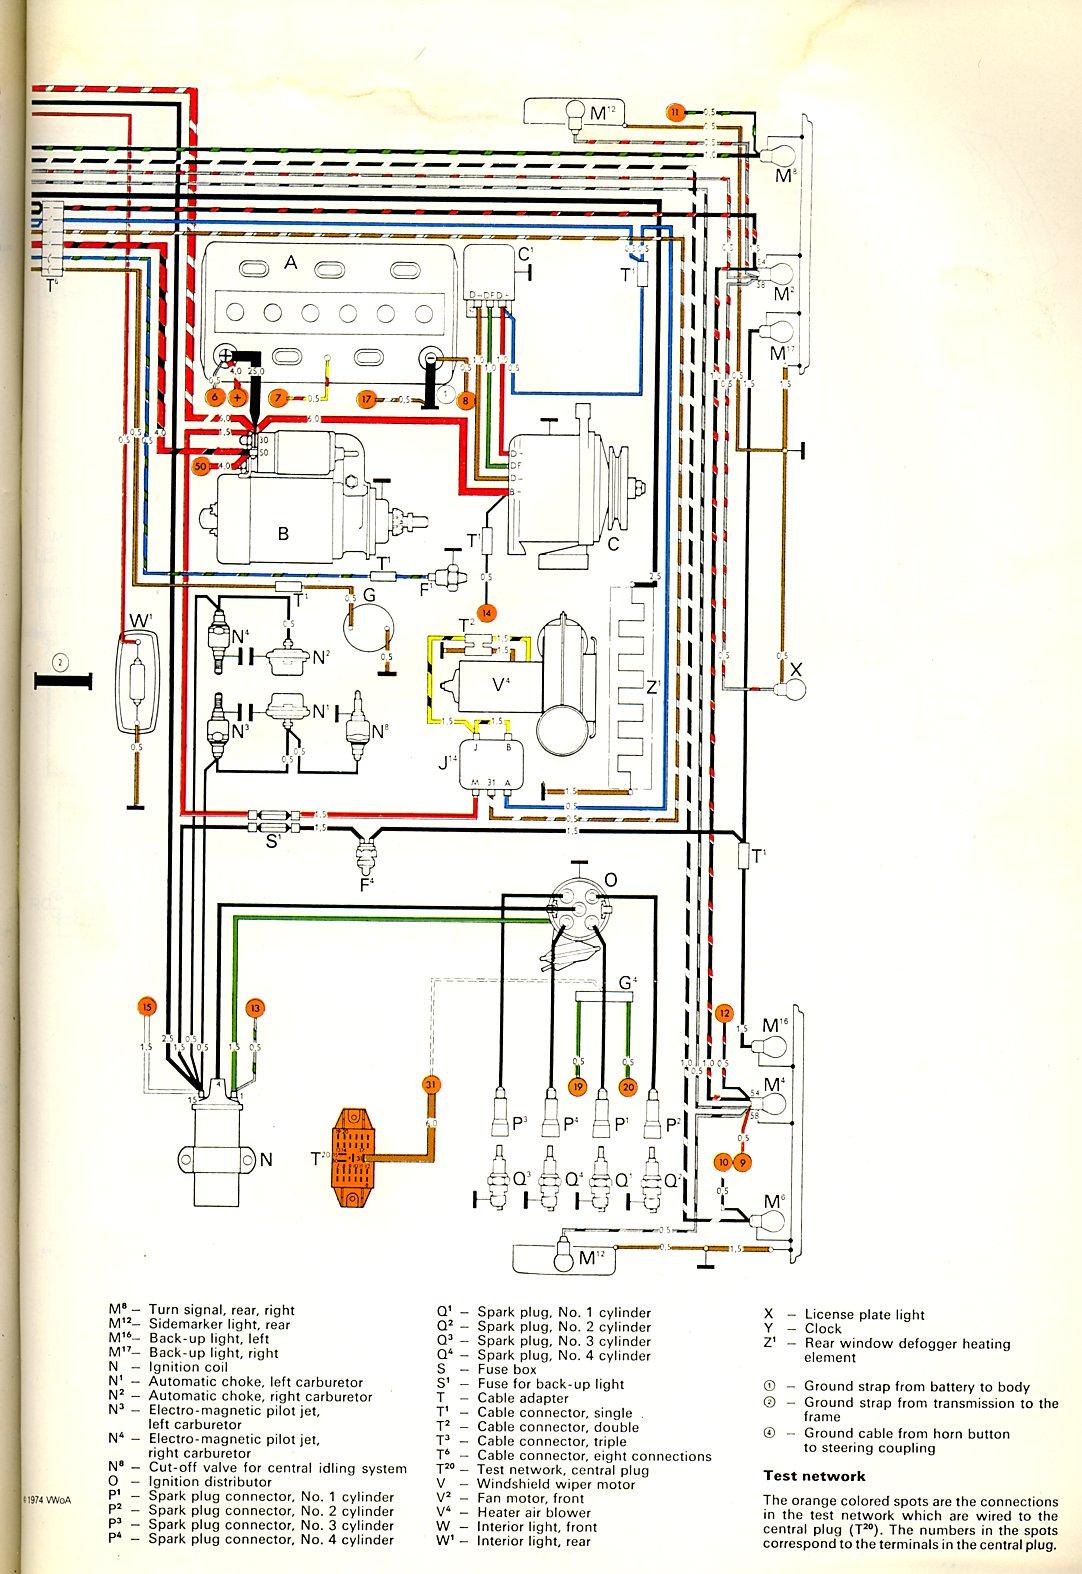 1968 Vw Bug Wiring Diagram 1972 Bus Wiring Diagram Thegoldenbug Com